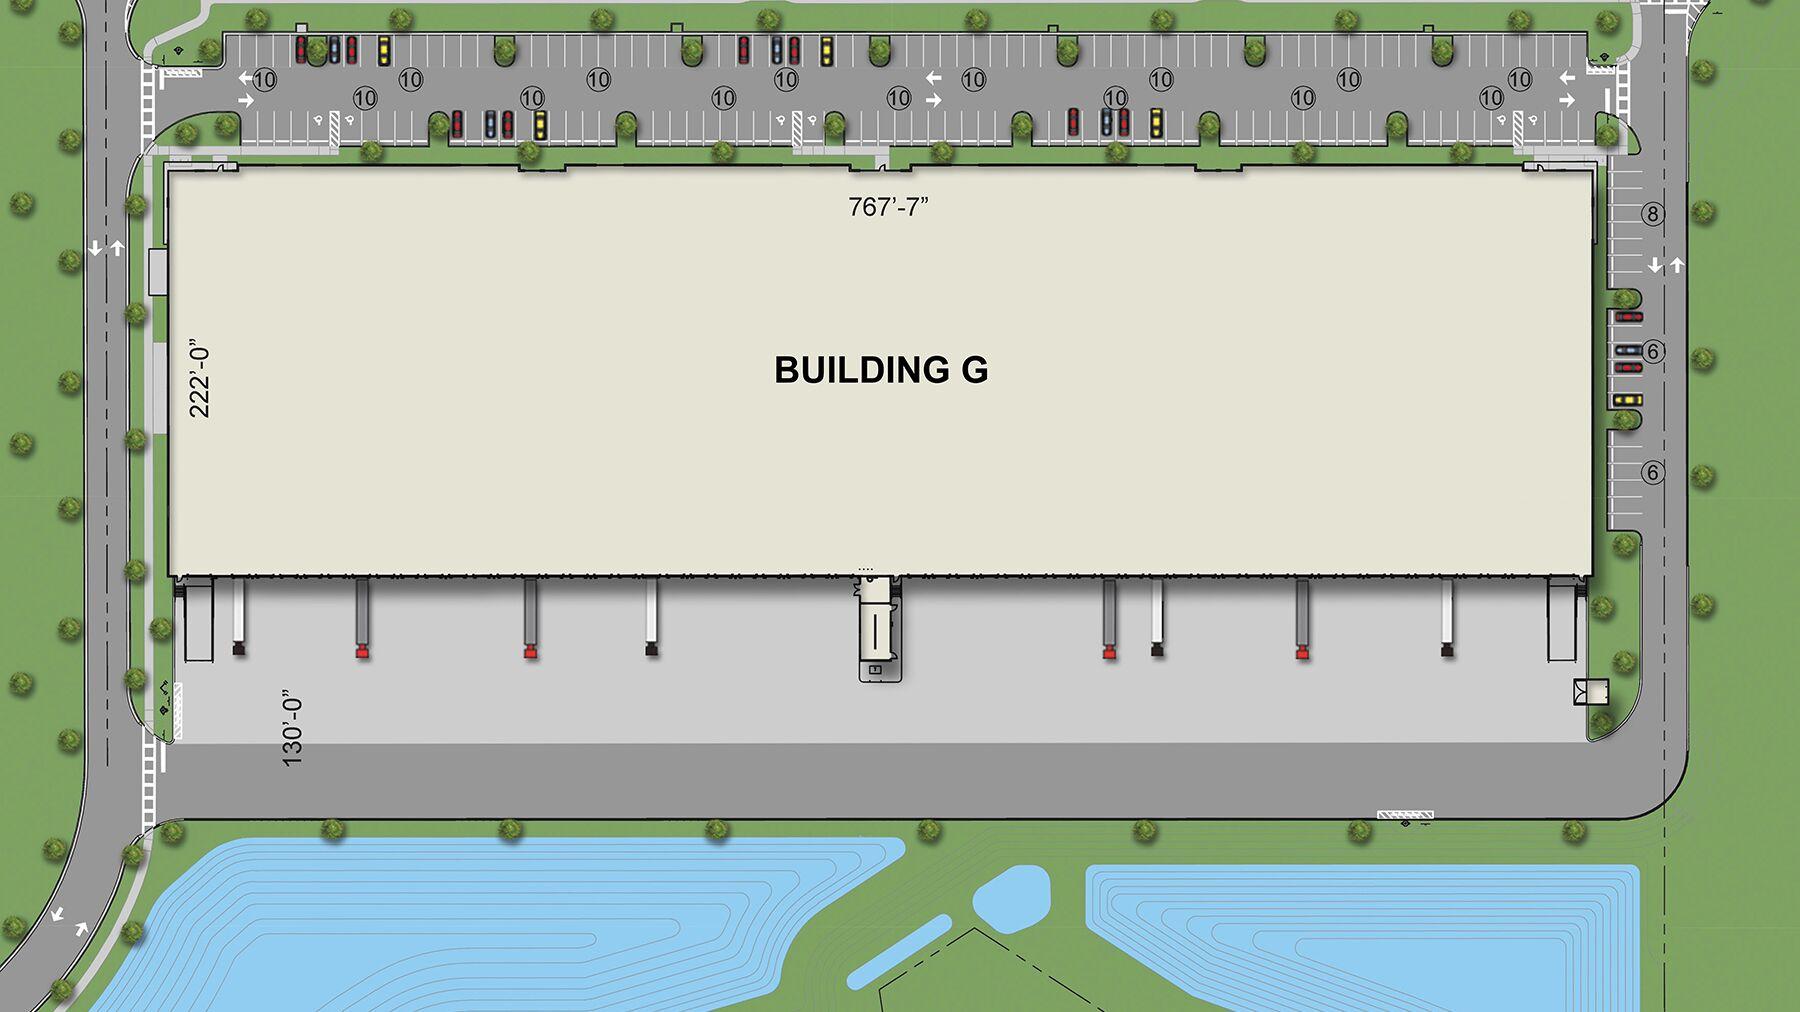 DPM-Prologis-Airport-DC-North_4752-Judge-Road.jpg